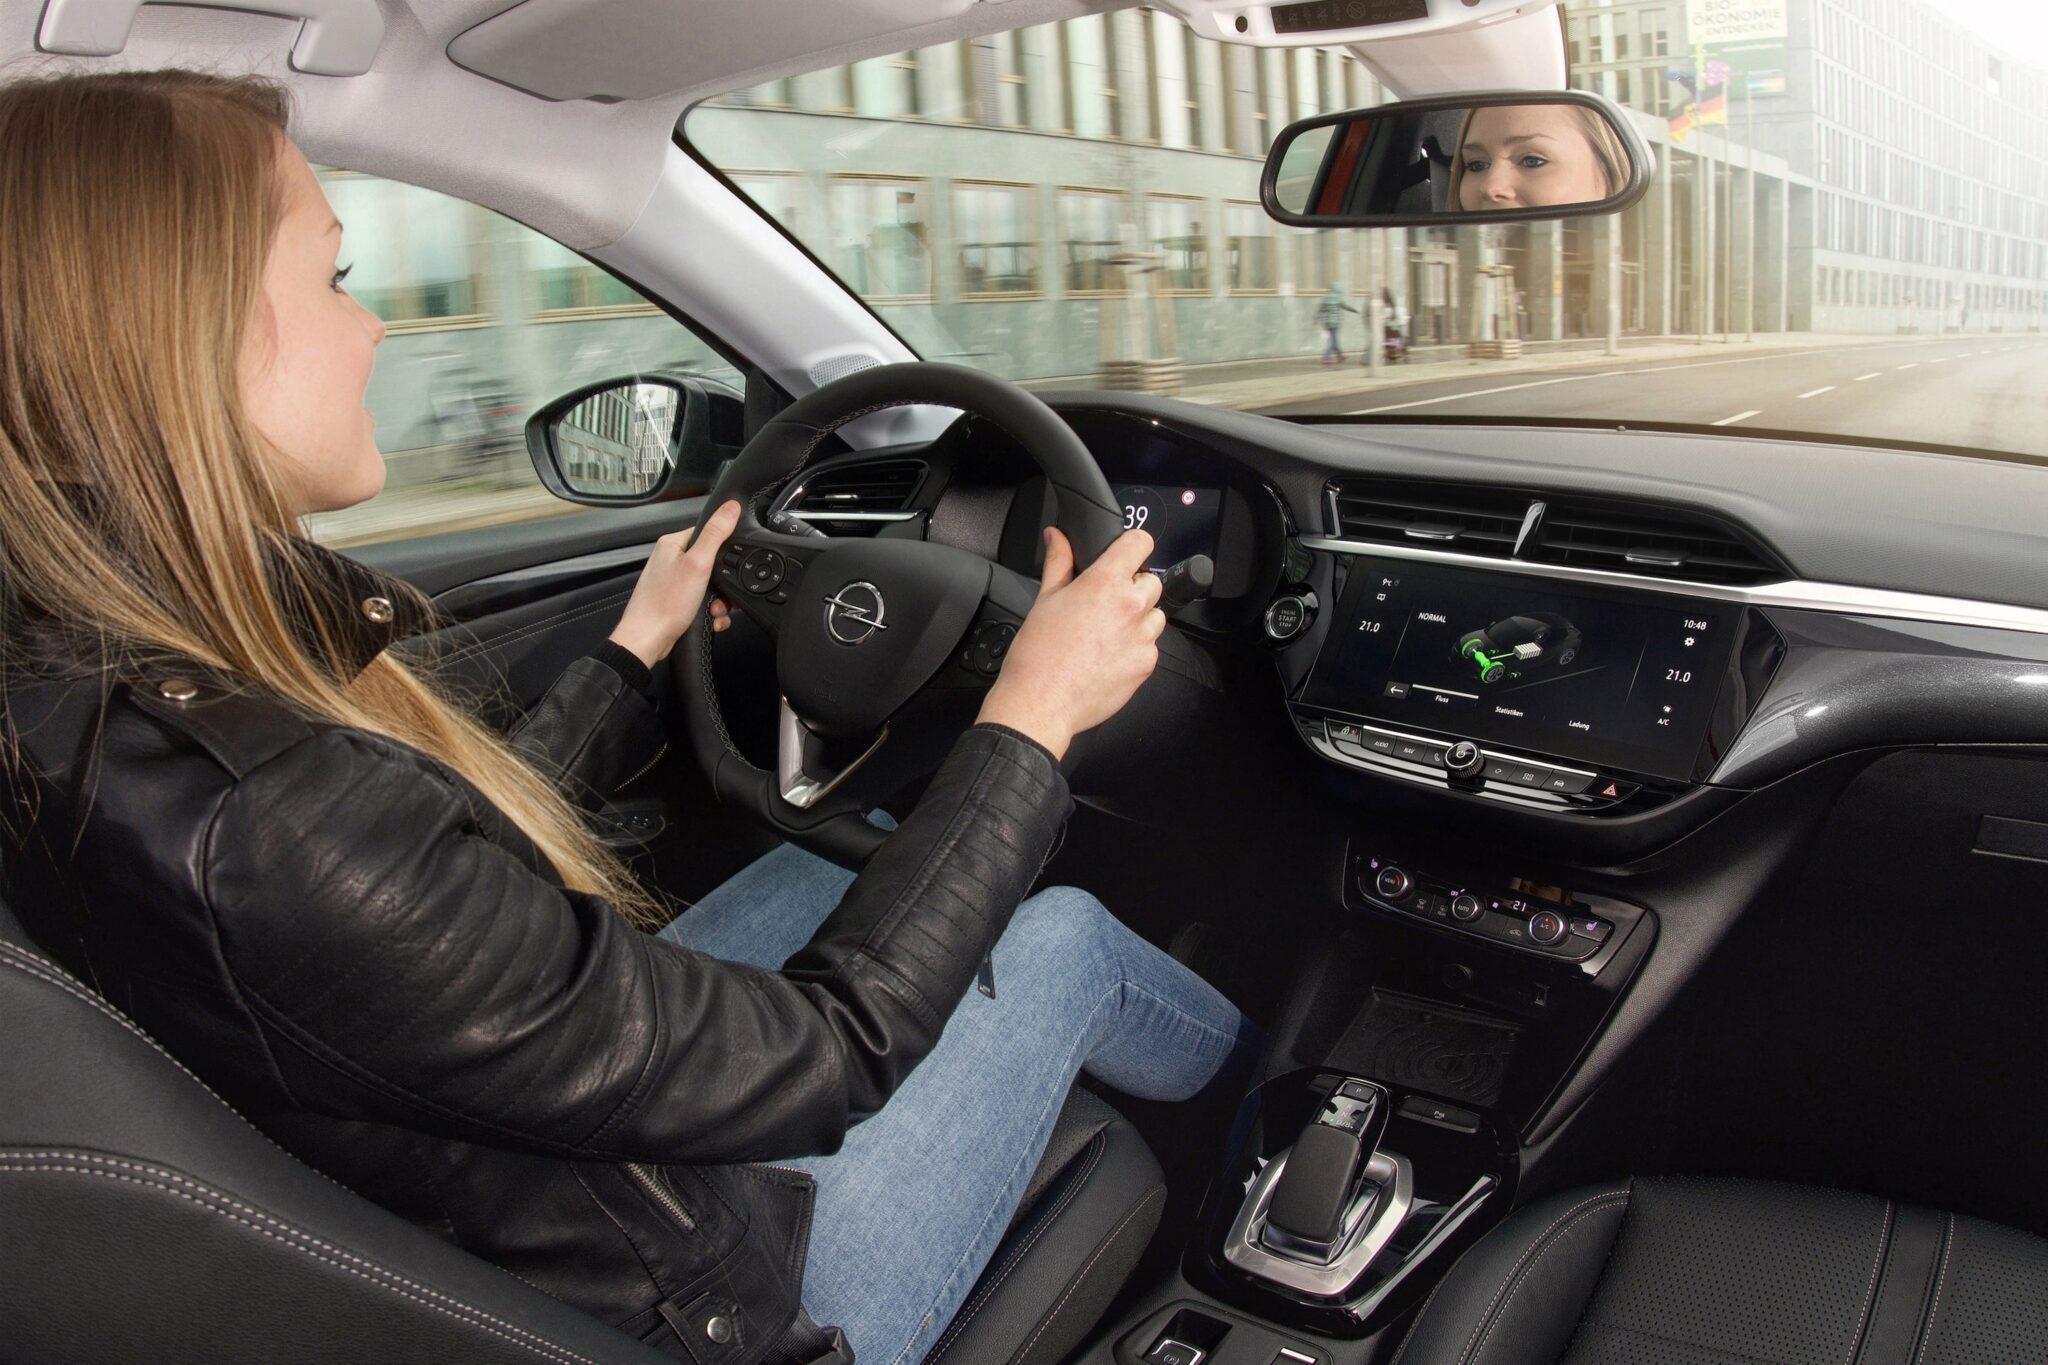 Opel Corsa E – ein Auto ohne Überraschungen? | 01 Opel Corsa e 511136 min scaled